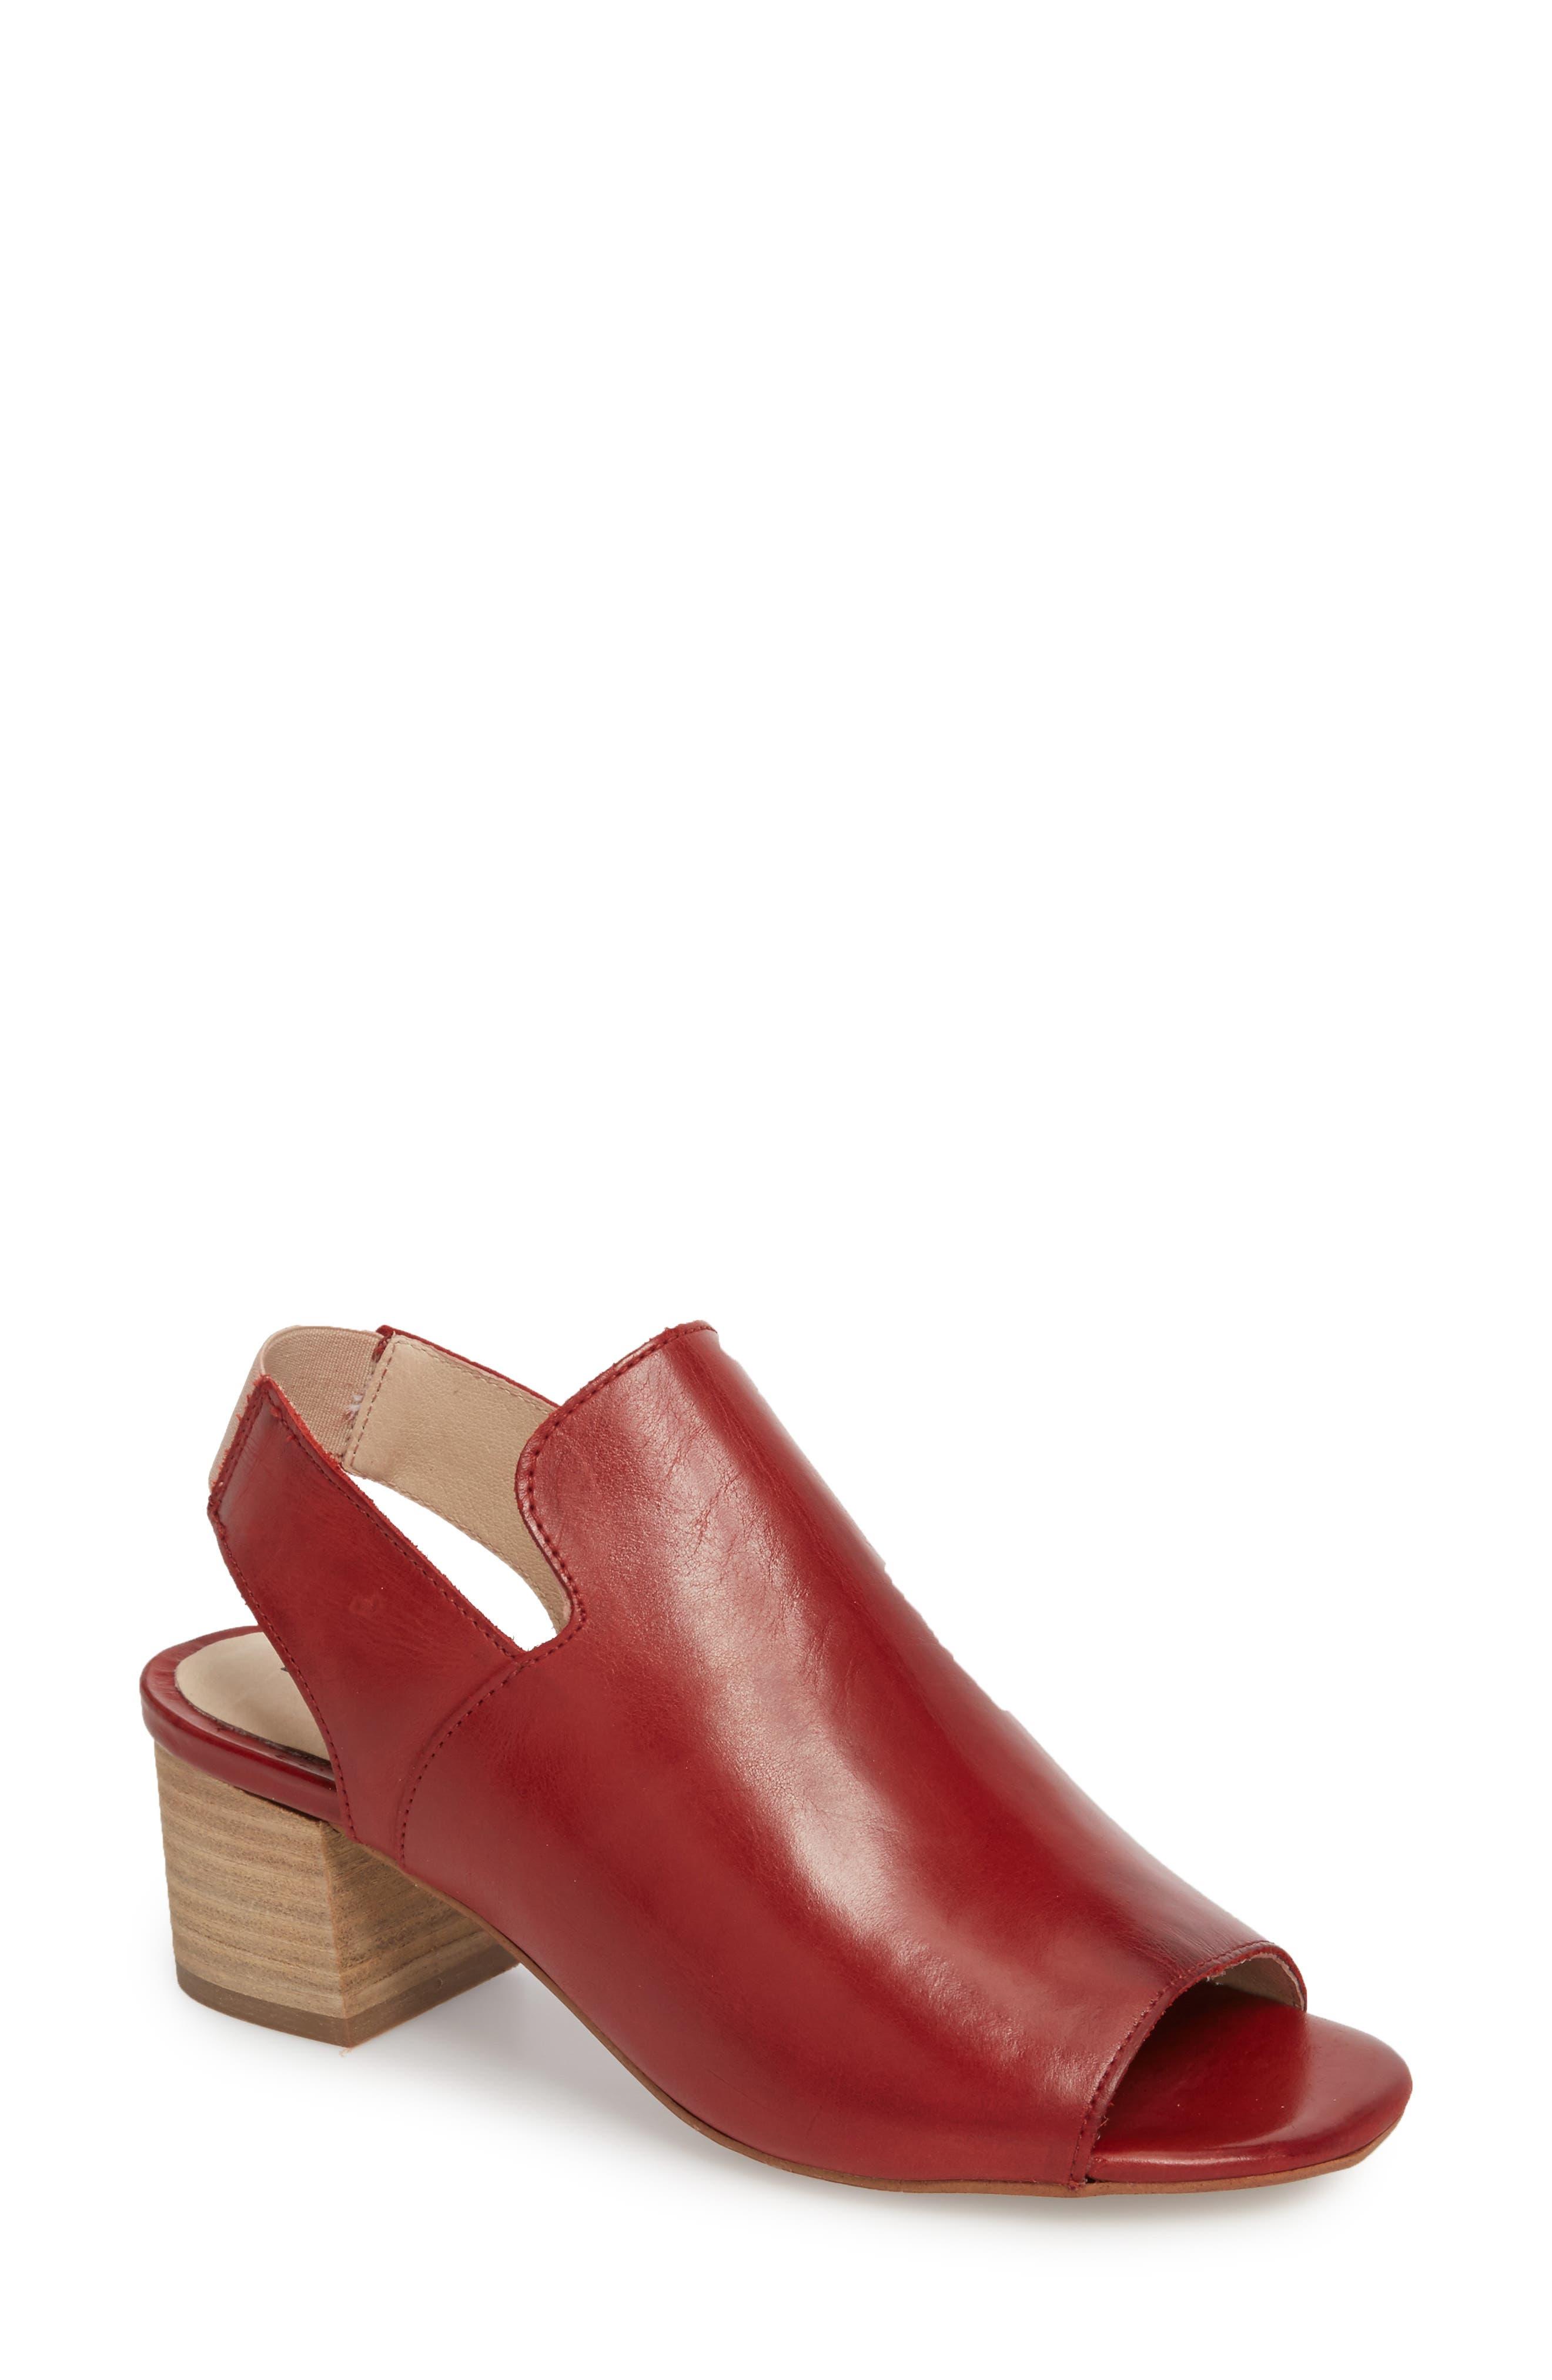 Bos. & Co. Zaire Slingback Sandal - Red